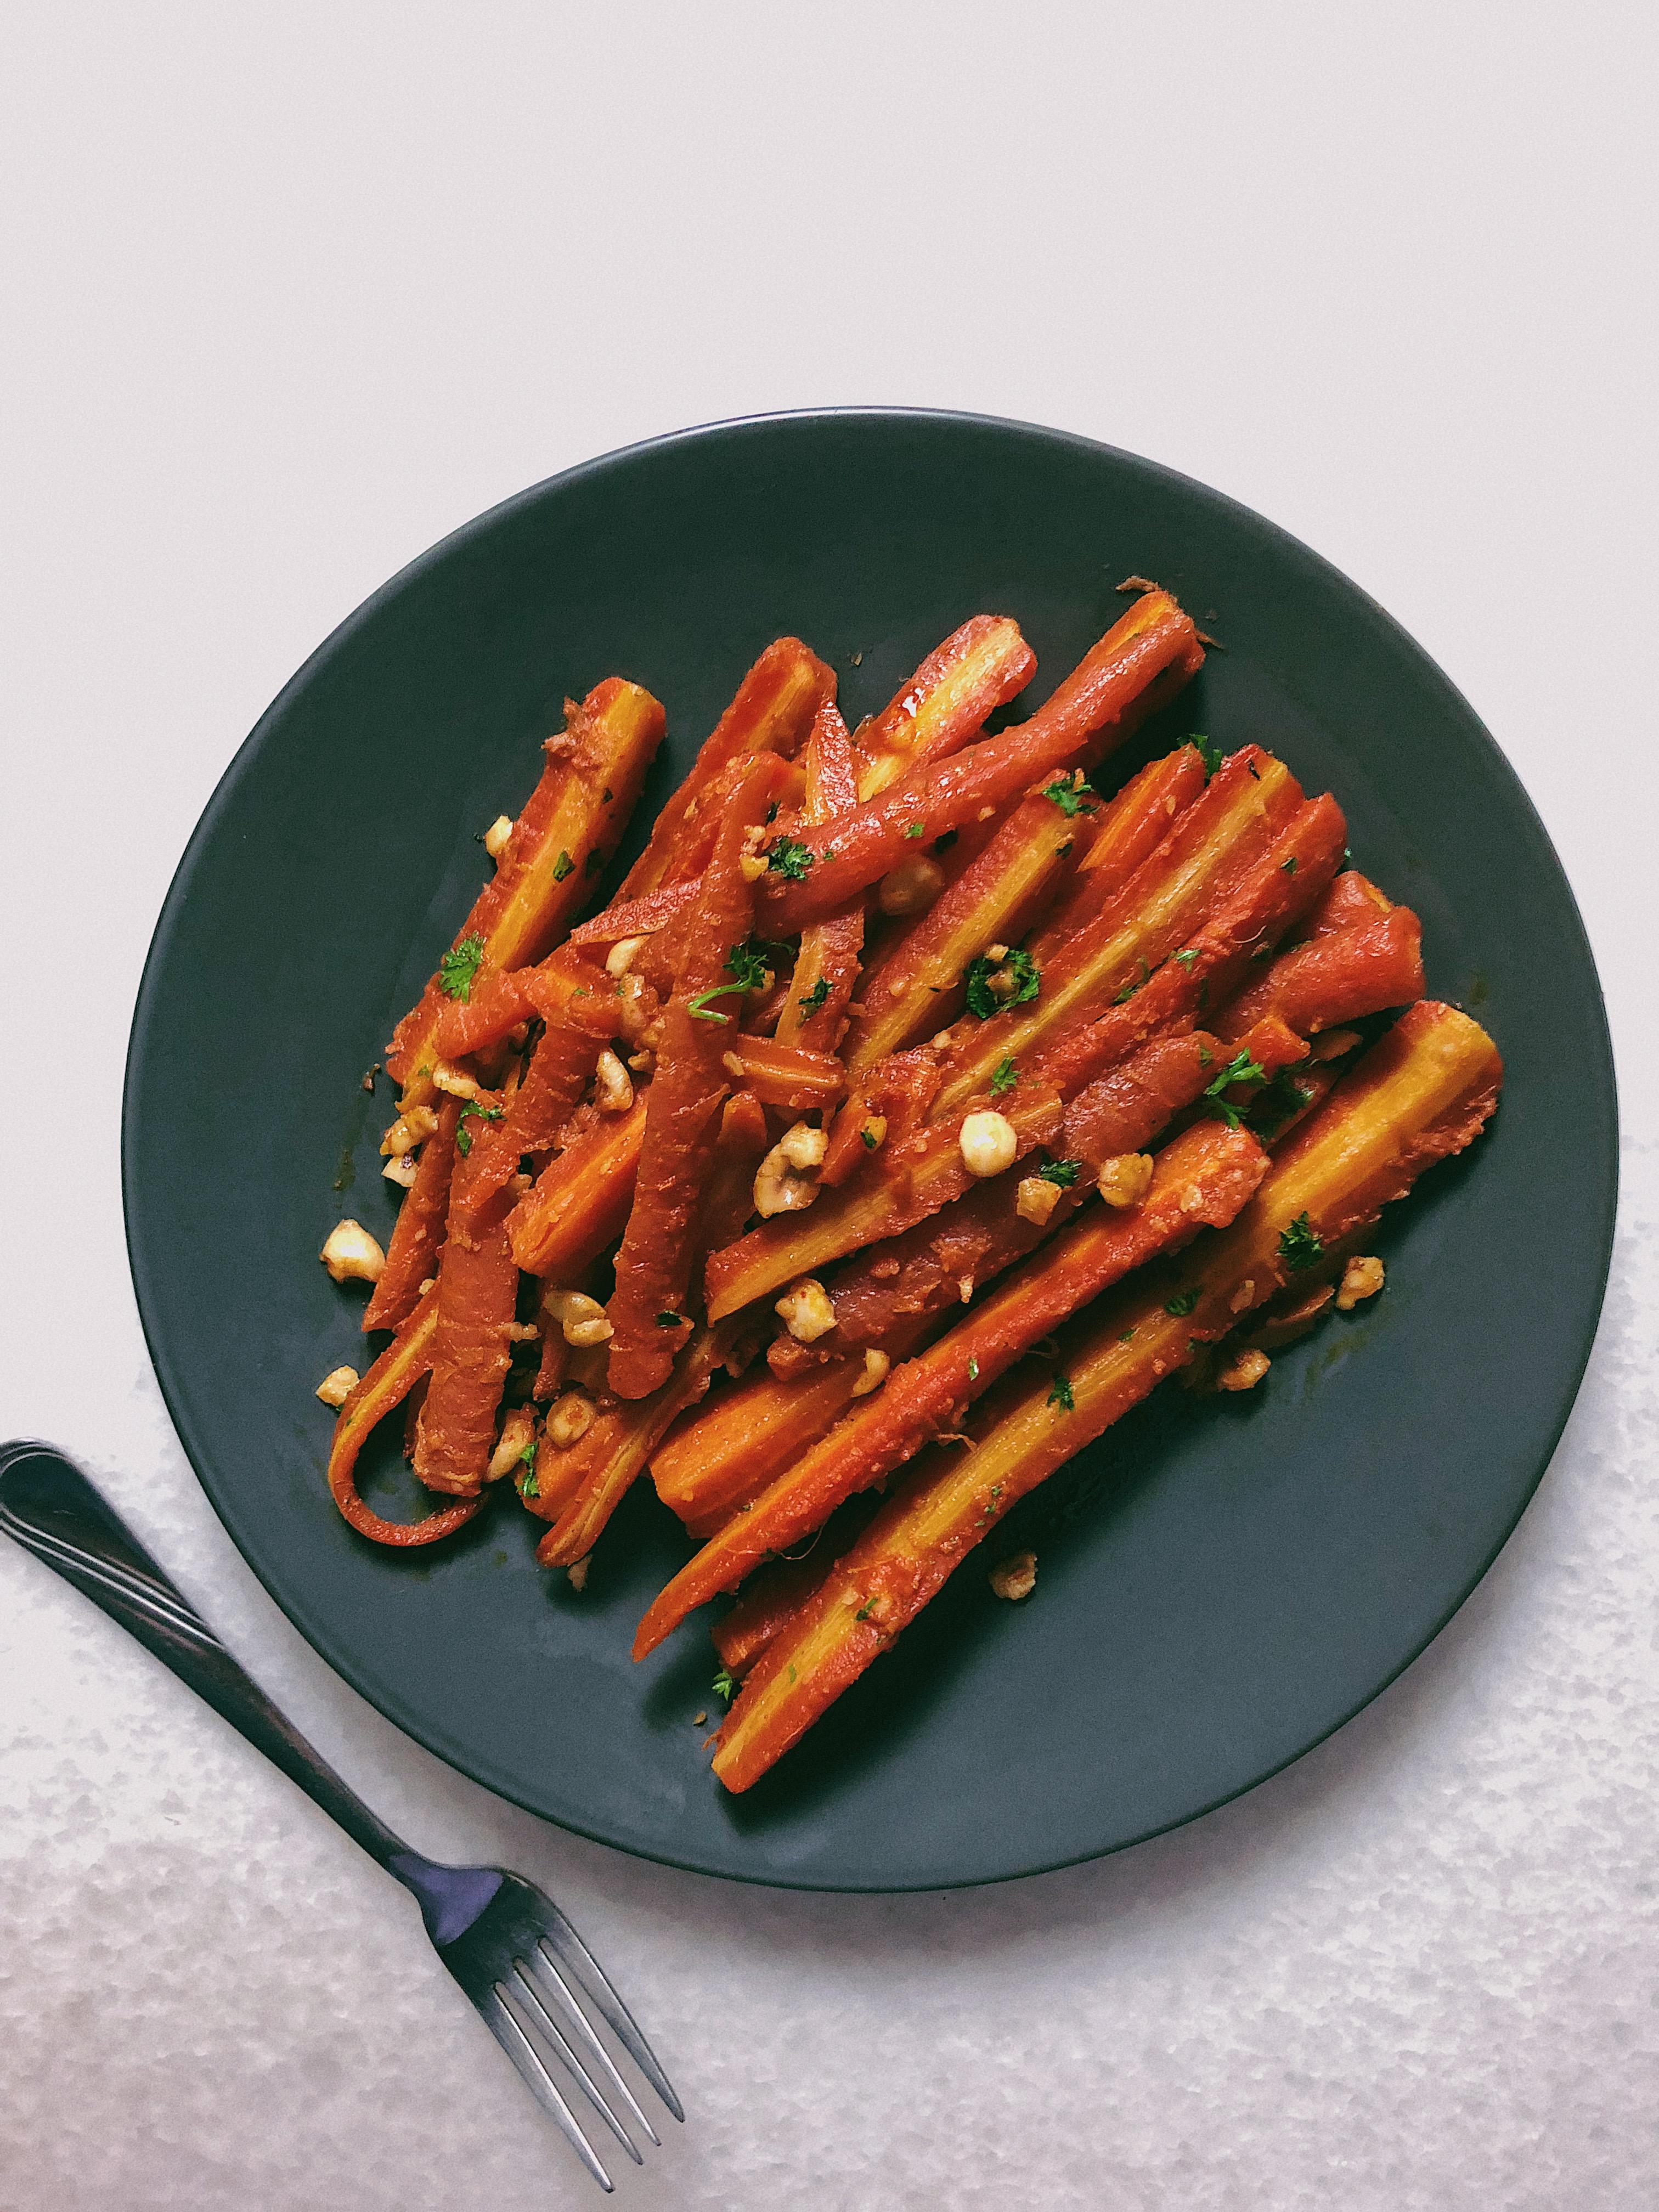 Three Seasonal Recipes + A Great Christmas Side Dish